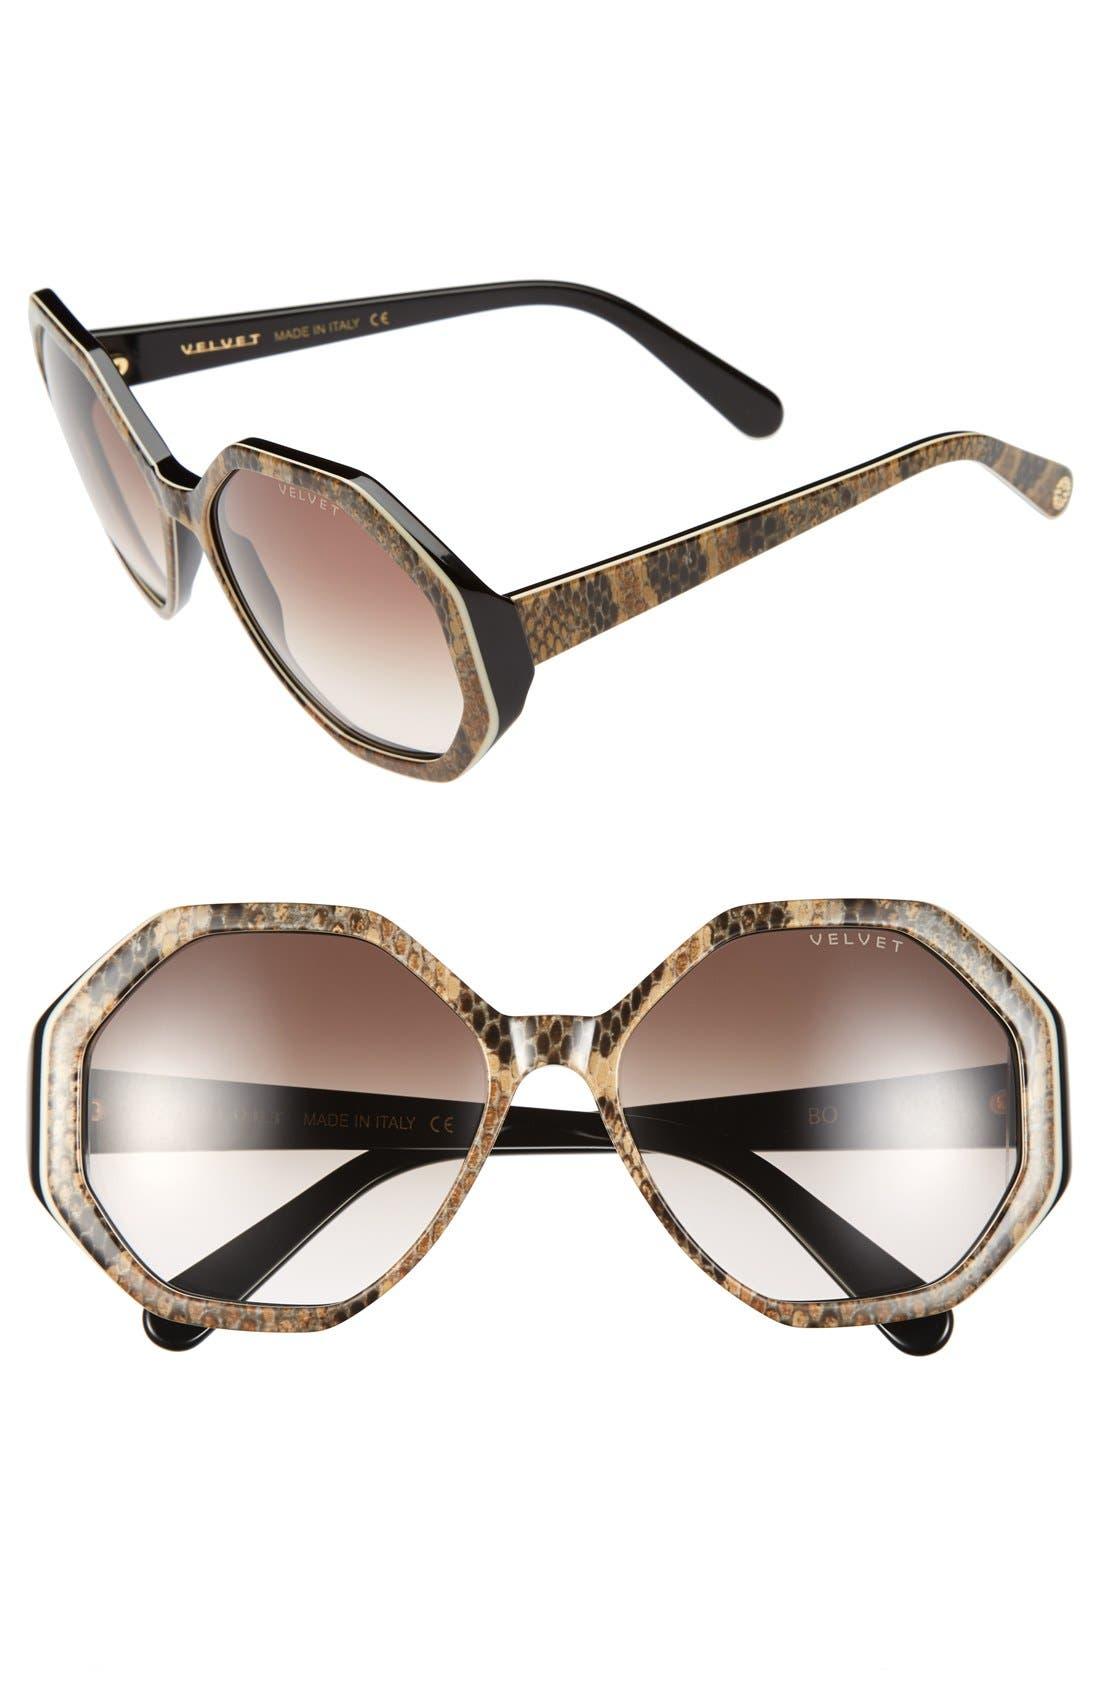 Main Image - Velvet Eyewear 'Jami' 56mm Sunglasses